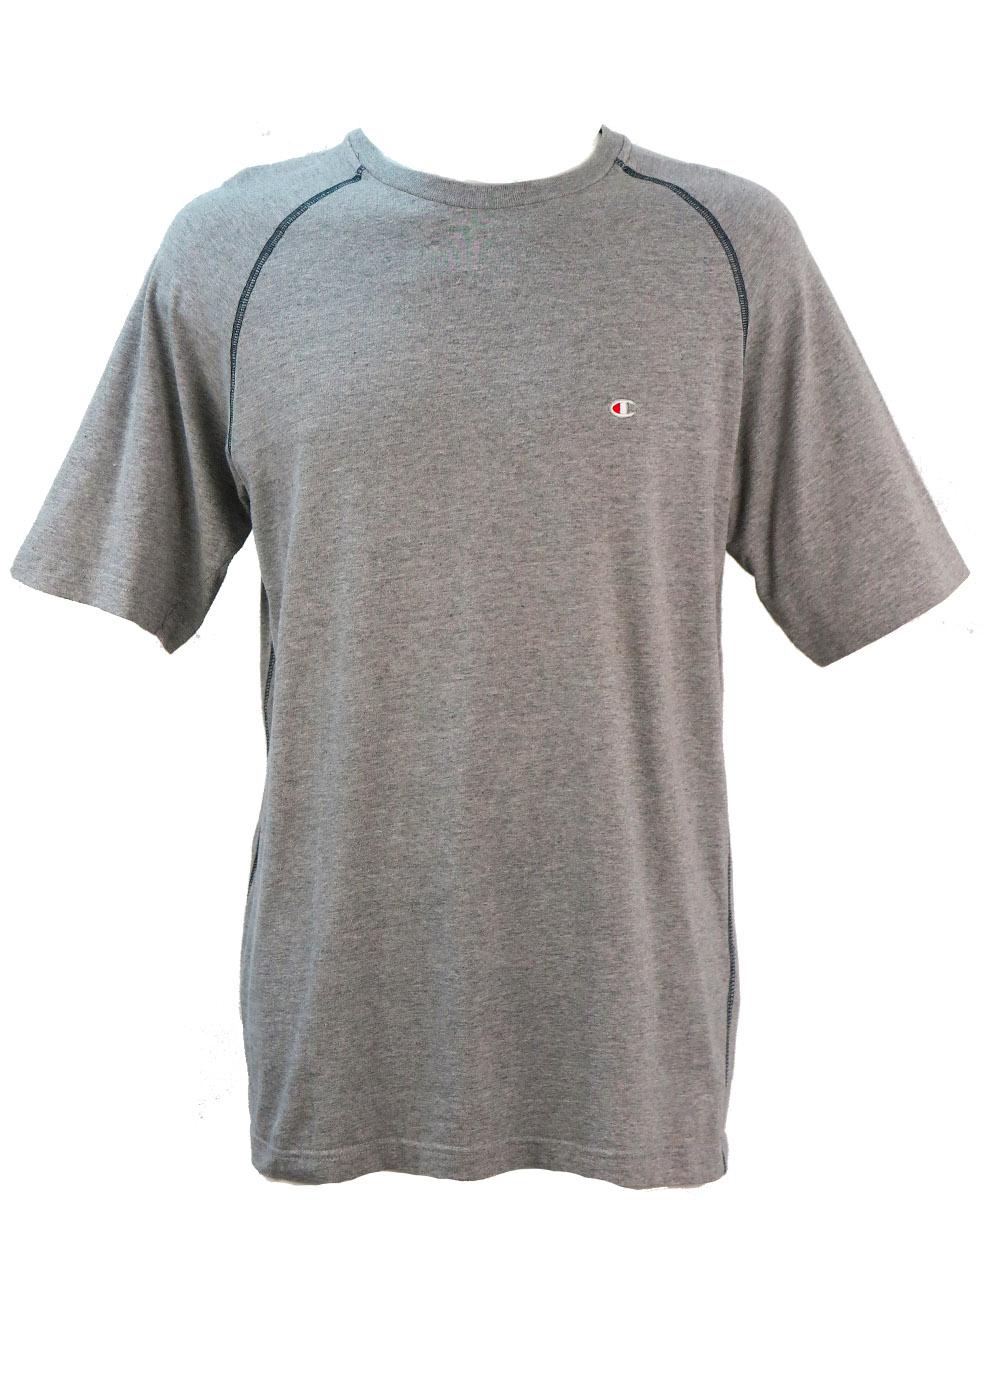 4ba1ca39 Grey Marl Champion T-Shirt with Navy Blue Overlock Stitch Detail – M ...